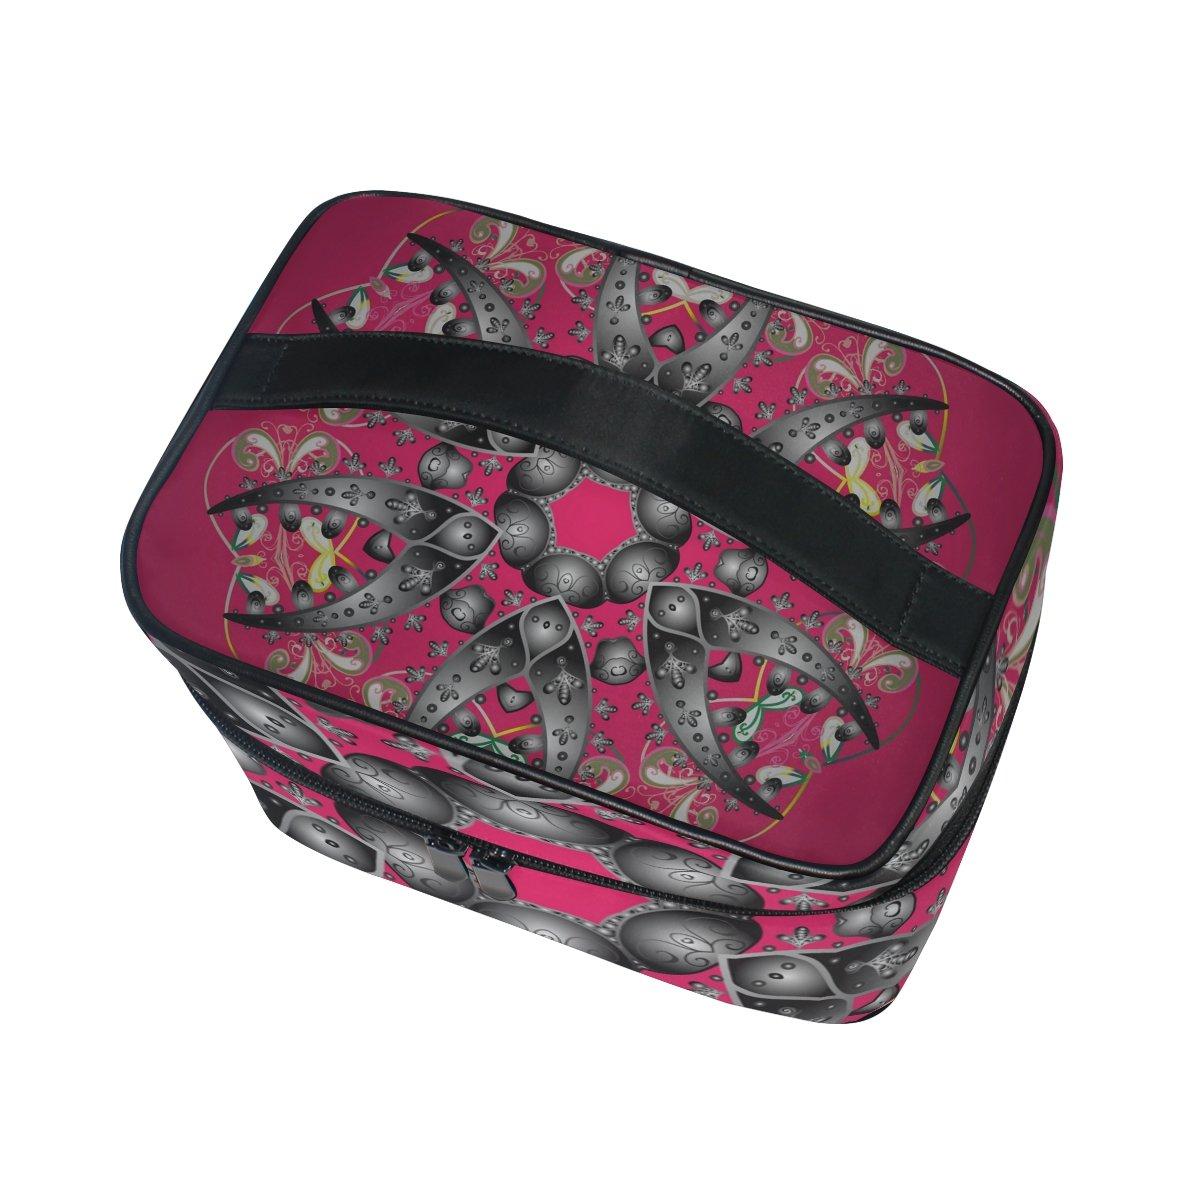 b2f92a2a2 ISAOA - Neceser multifuncional para maquillaje, diseño de mandala, copo de  nieve, bolsa de aseo, bolsa de viaje para cosméticos, bolsa de  almacenamiento, ...